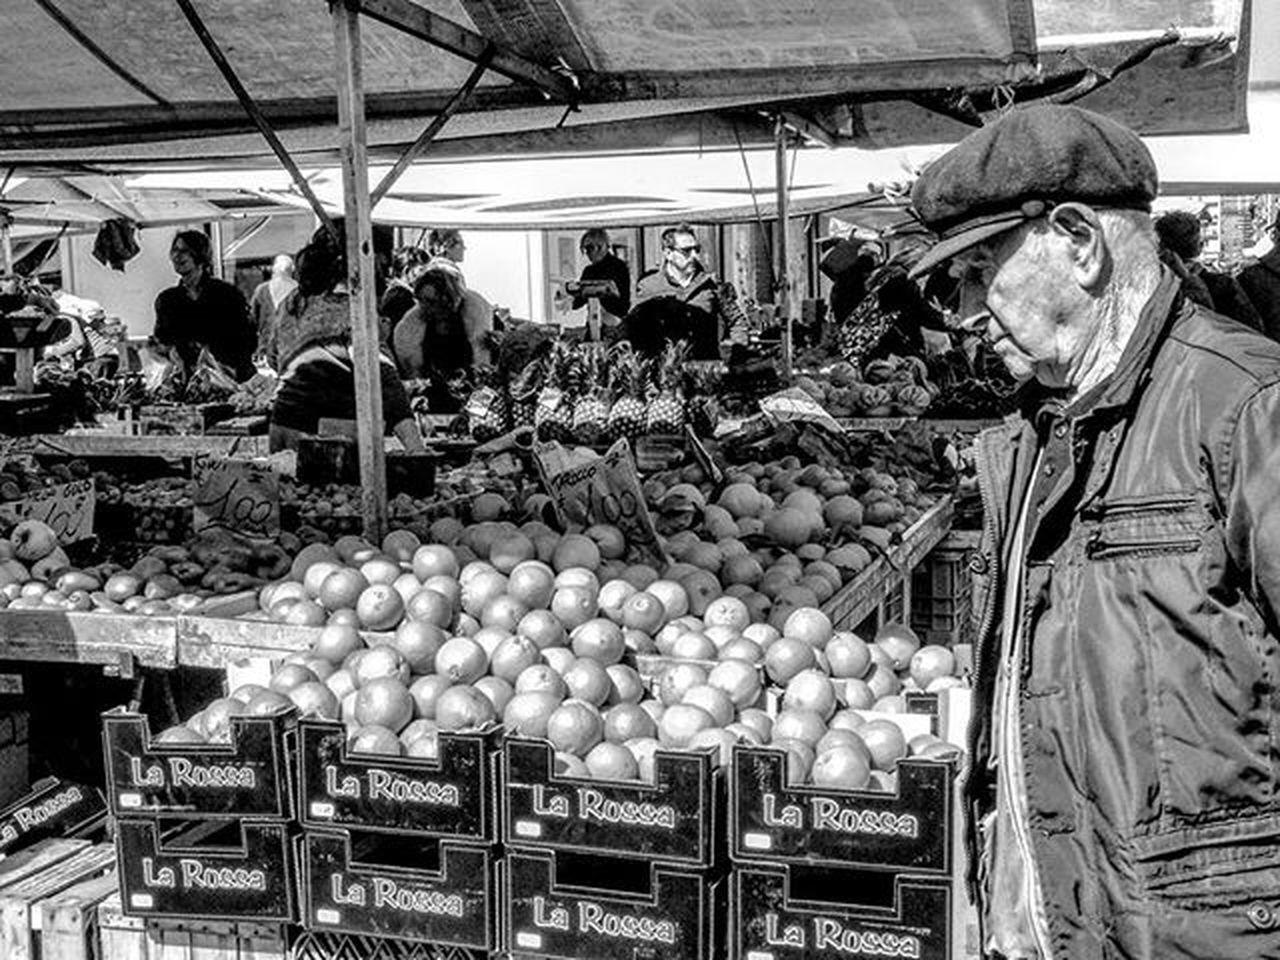 Quando si fotografano persone a colori, si fotografano i loro vestiti. Ma quando si fotografano persone in bianco e nero, si fotografano le loro anime! Ted Grant @VOLGOTOSCANA @IG_TOSCANA_ @IG_LIVORNO_ Street Art Streetphotography Streetart Biancoenero Blackandwhite Bw Bnw Picoftheday Igersitalia Instagood Photooftheday Livorno Igerslivorno Toscana Igerstoscana Pisa Igerspisa Firenze Igersfirenze Roma Igersroma Milano Igersmilano Torino igerstorino